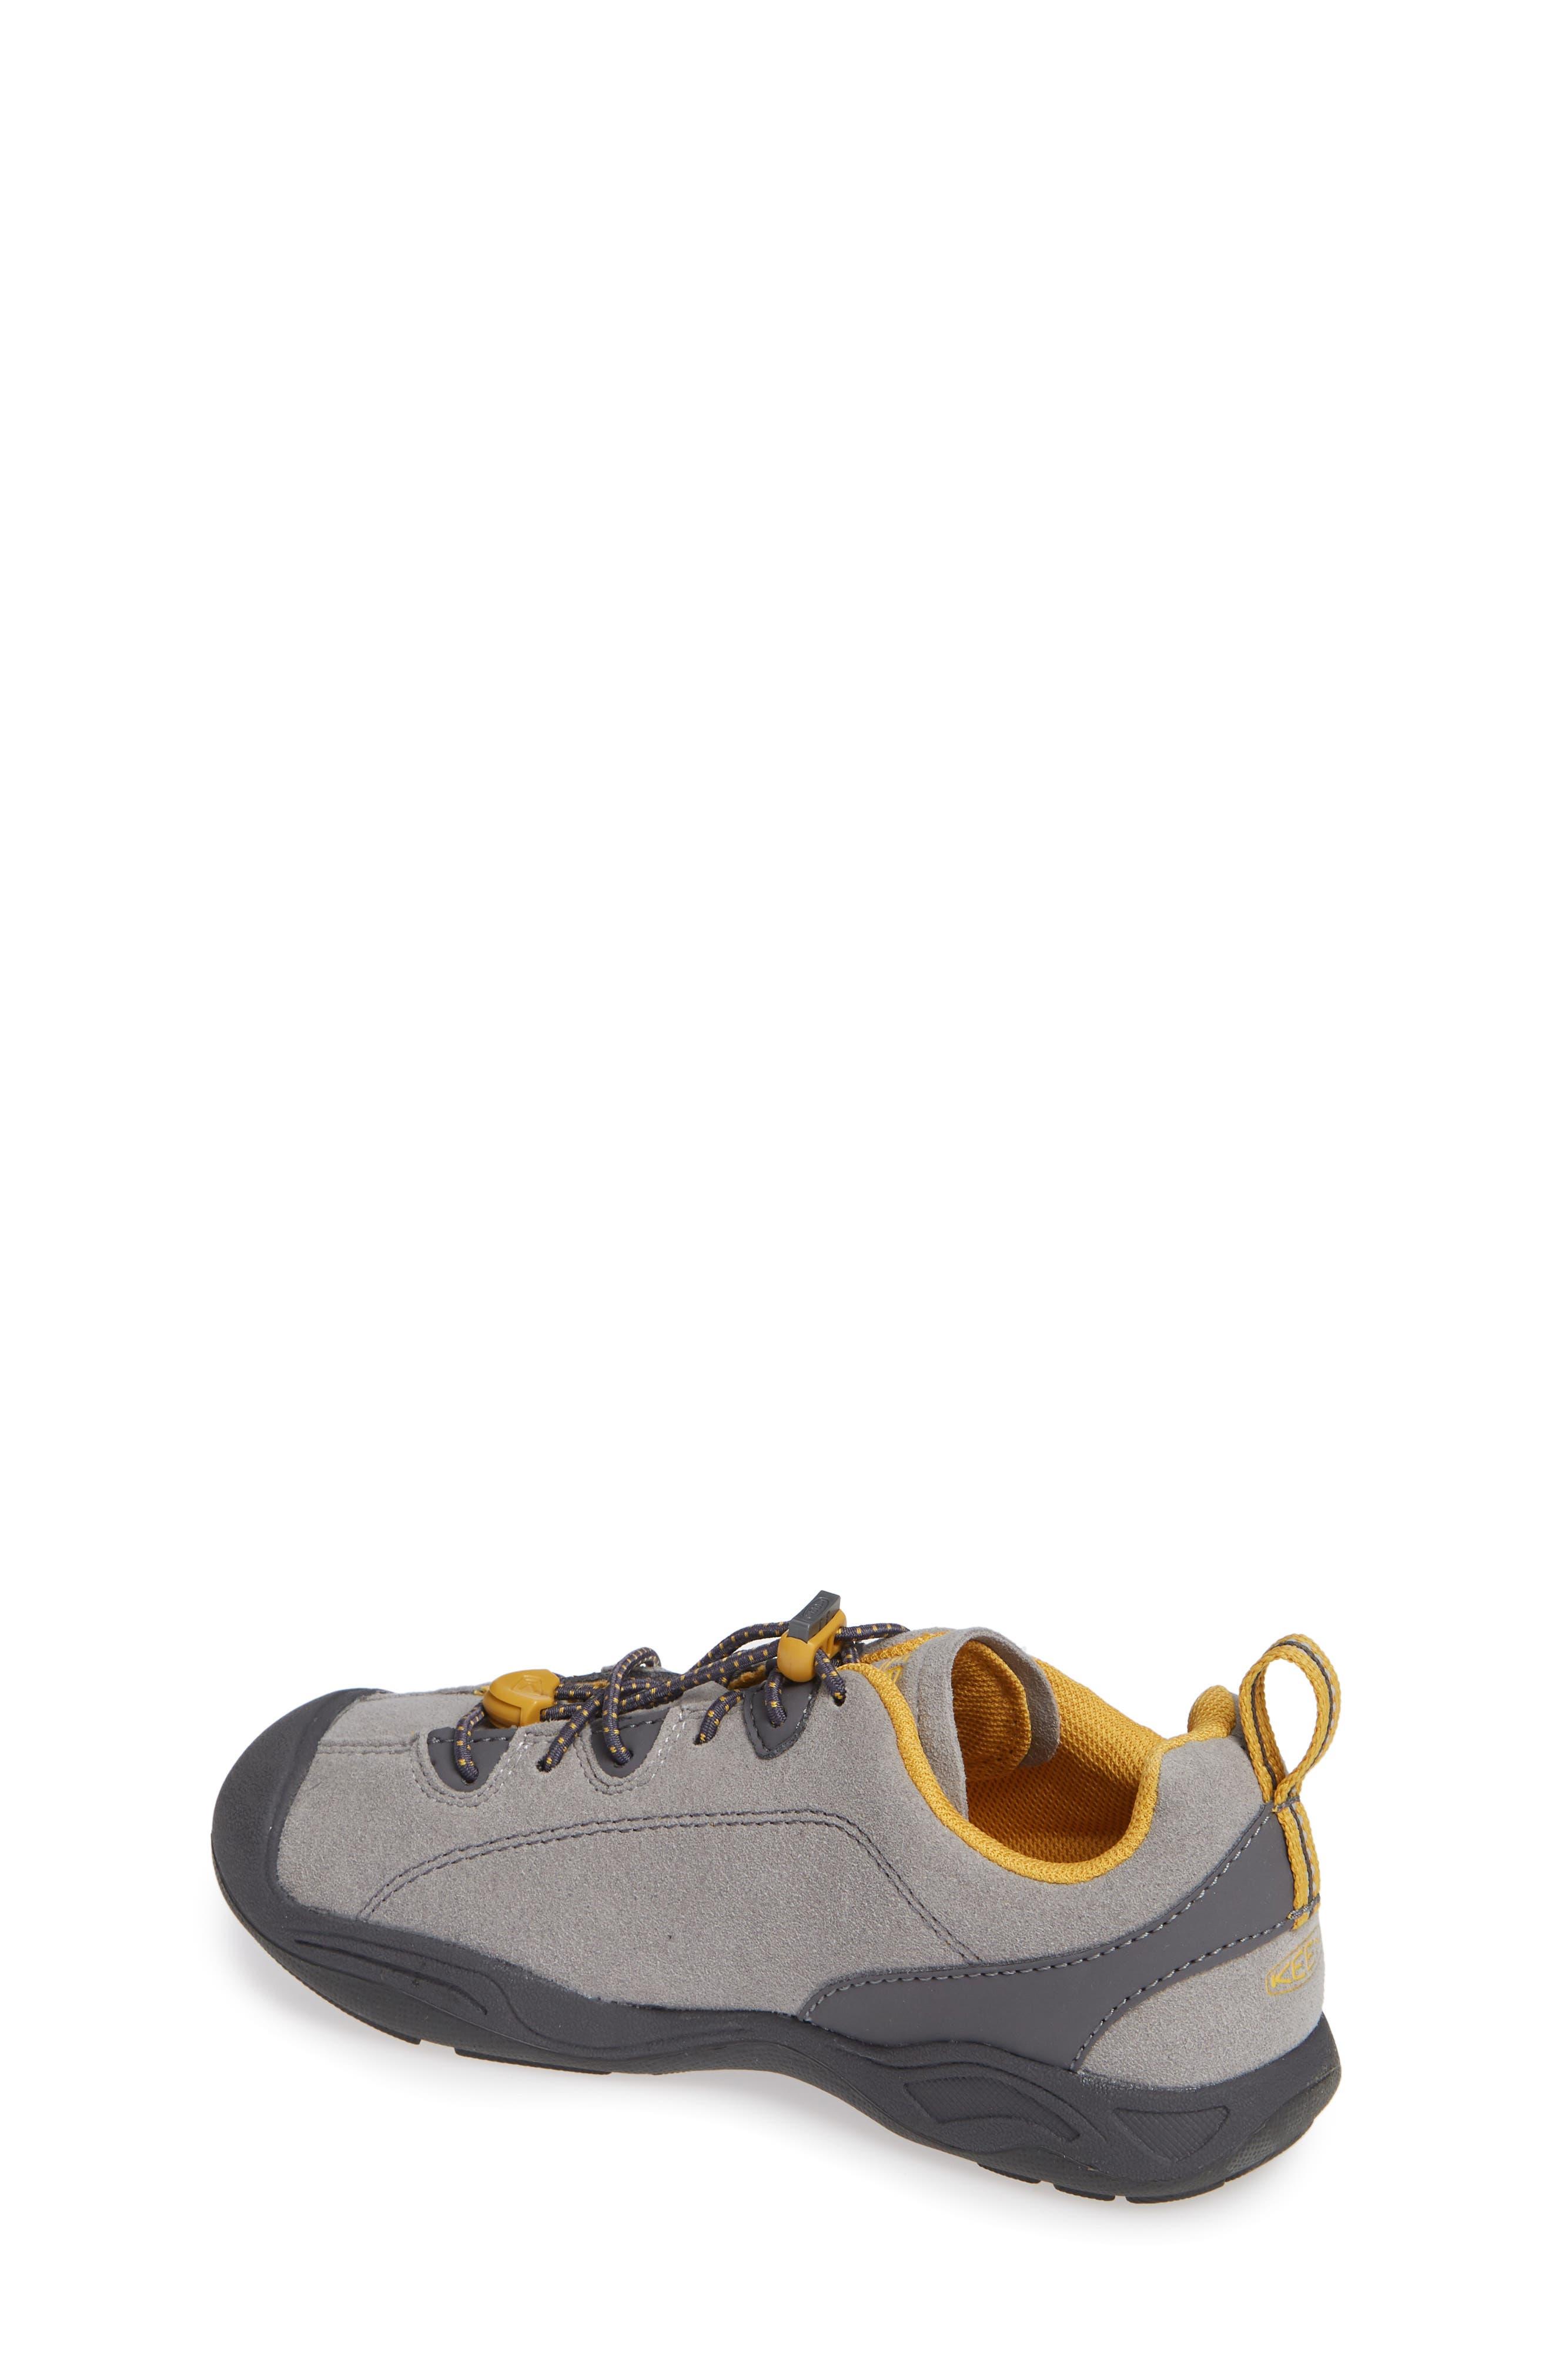 Jasper Sneaker,                             Alternate thumbnail 2, color,                             GREY/ ARROWWOOD